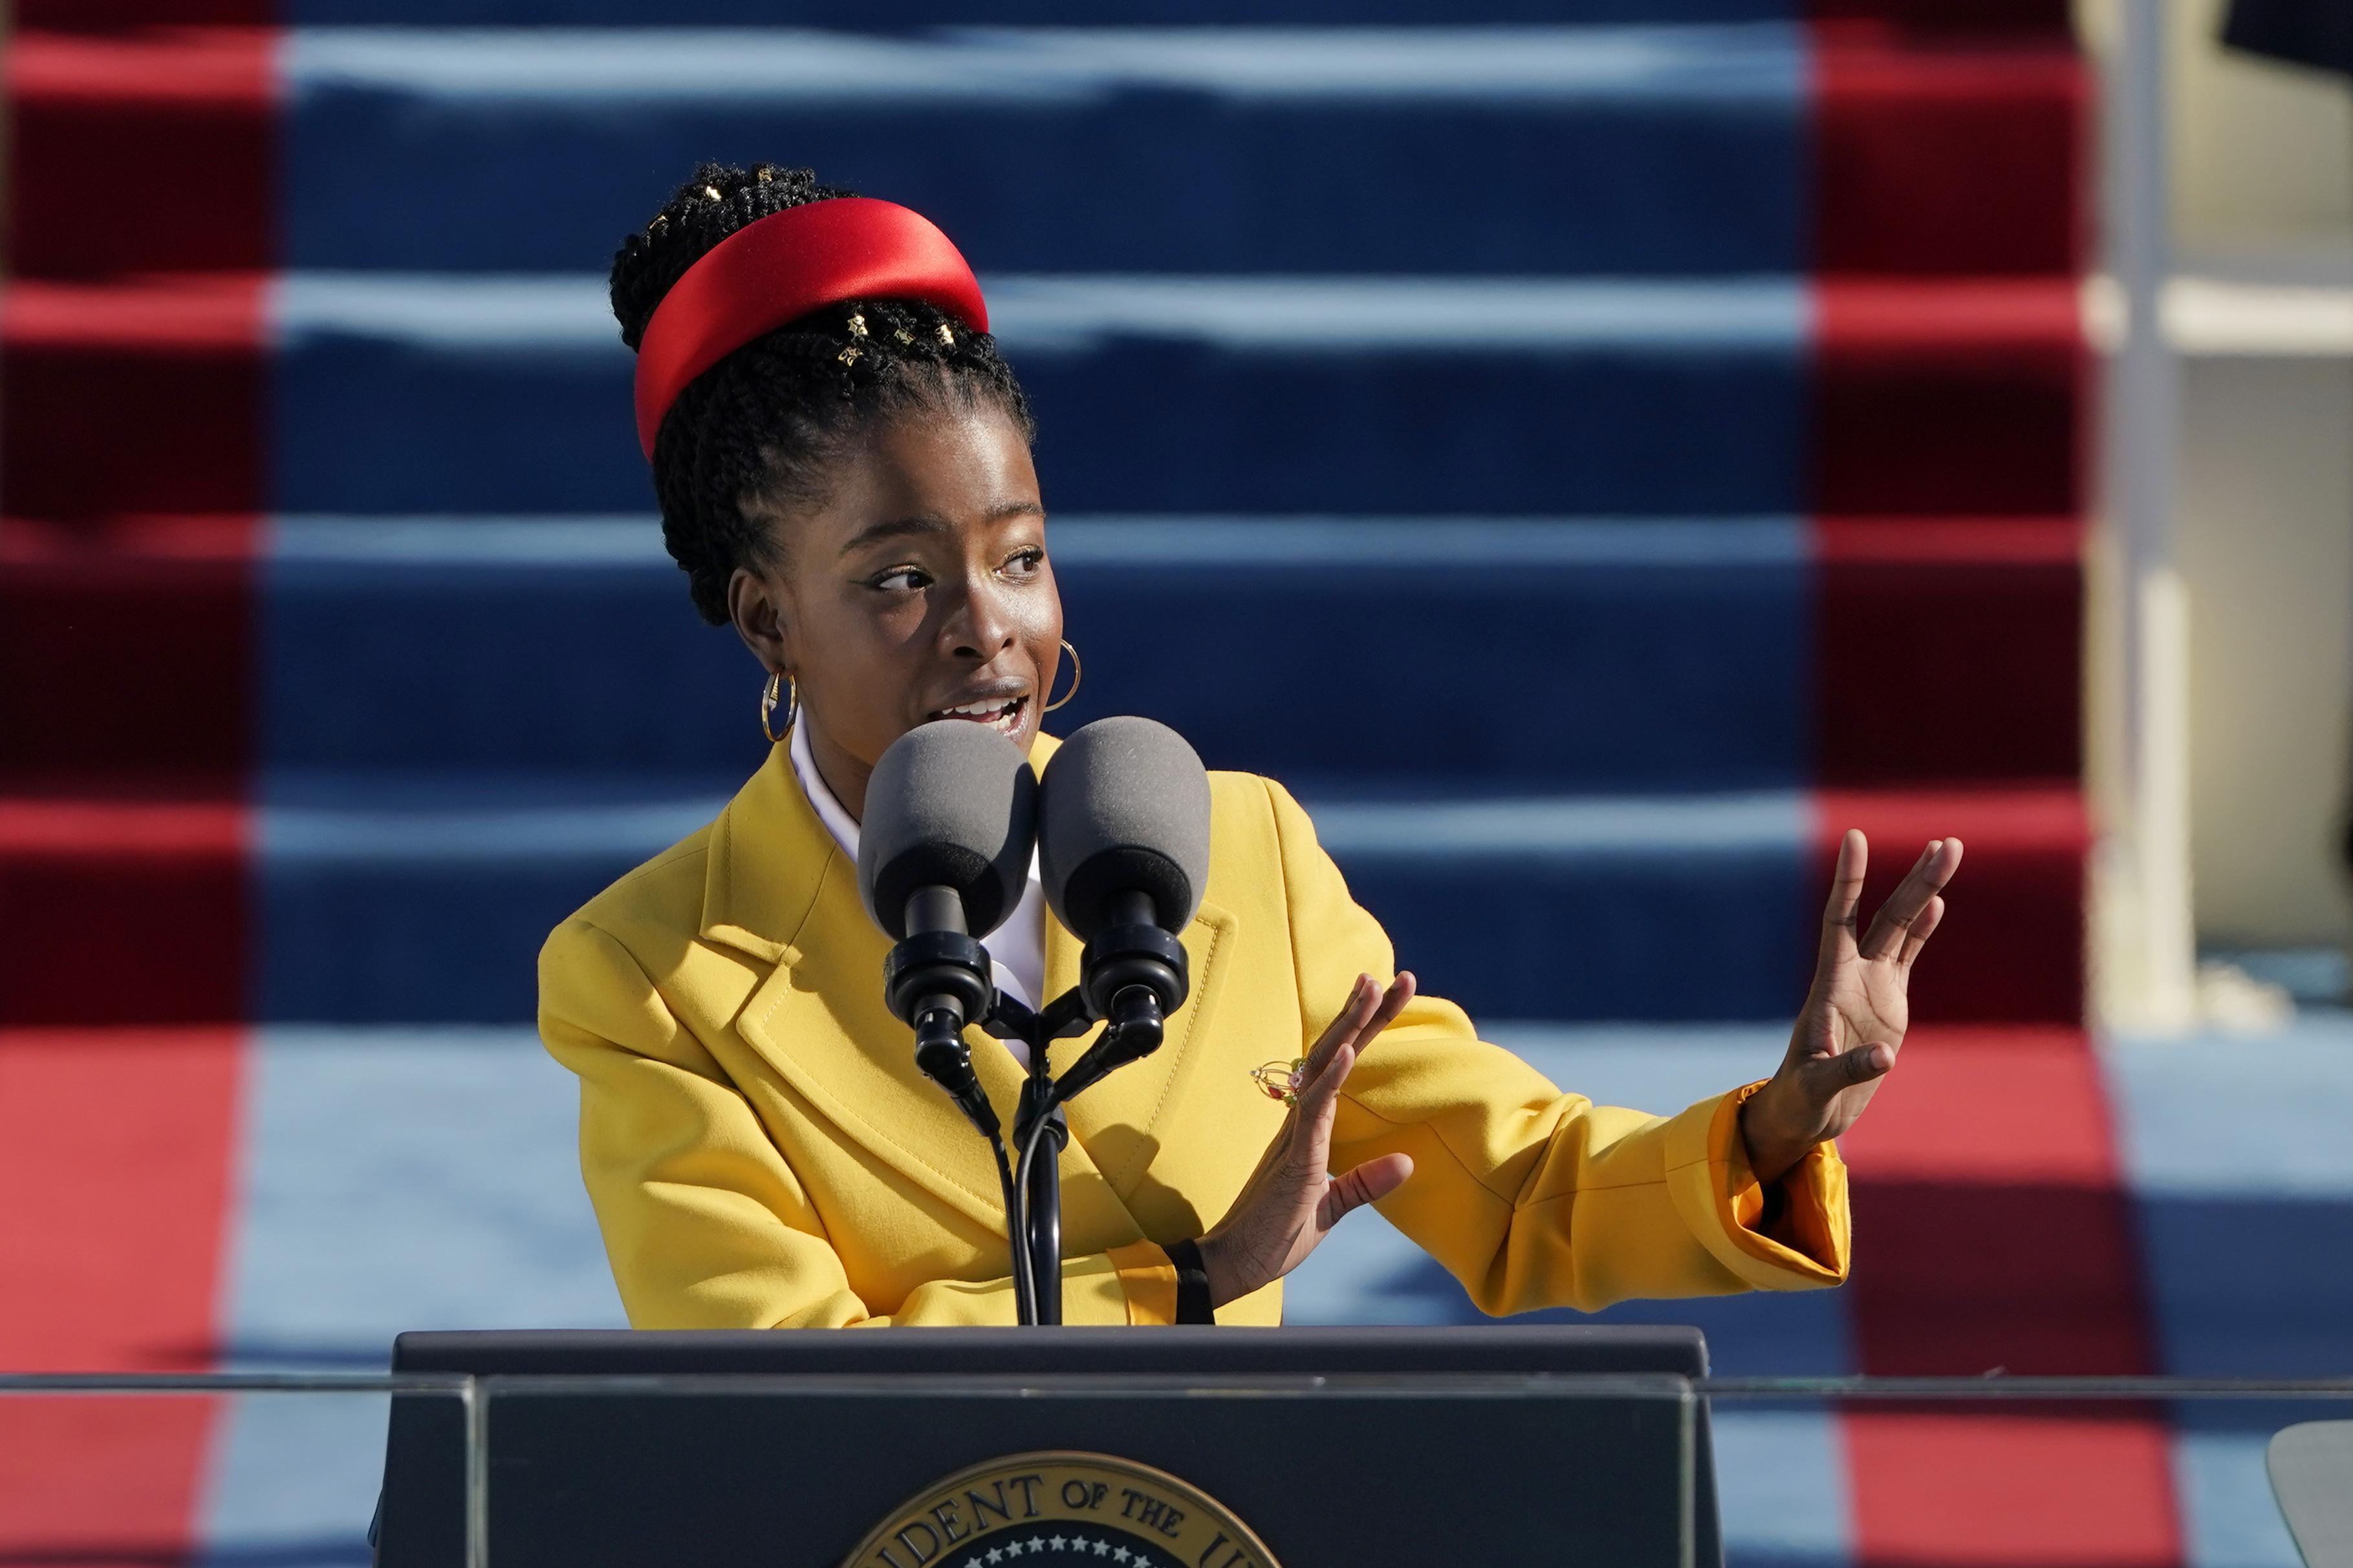 American poet Amanda Gorman recites a poem during the Inauguration of U.S. President Joe Biden at the U.S. Capitol in Washington, D.C., on Jan. 20, 2021.